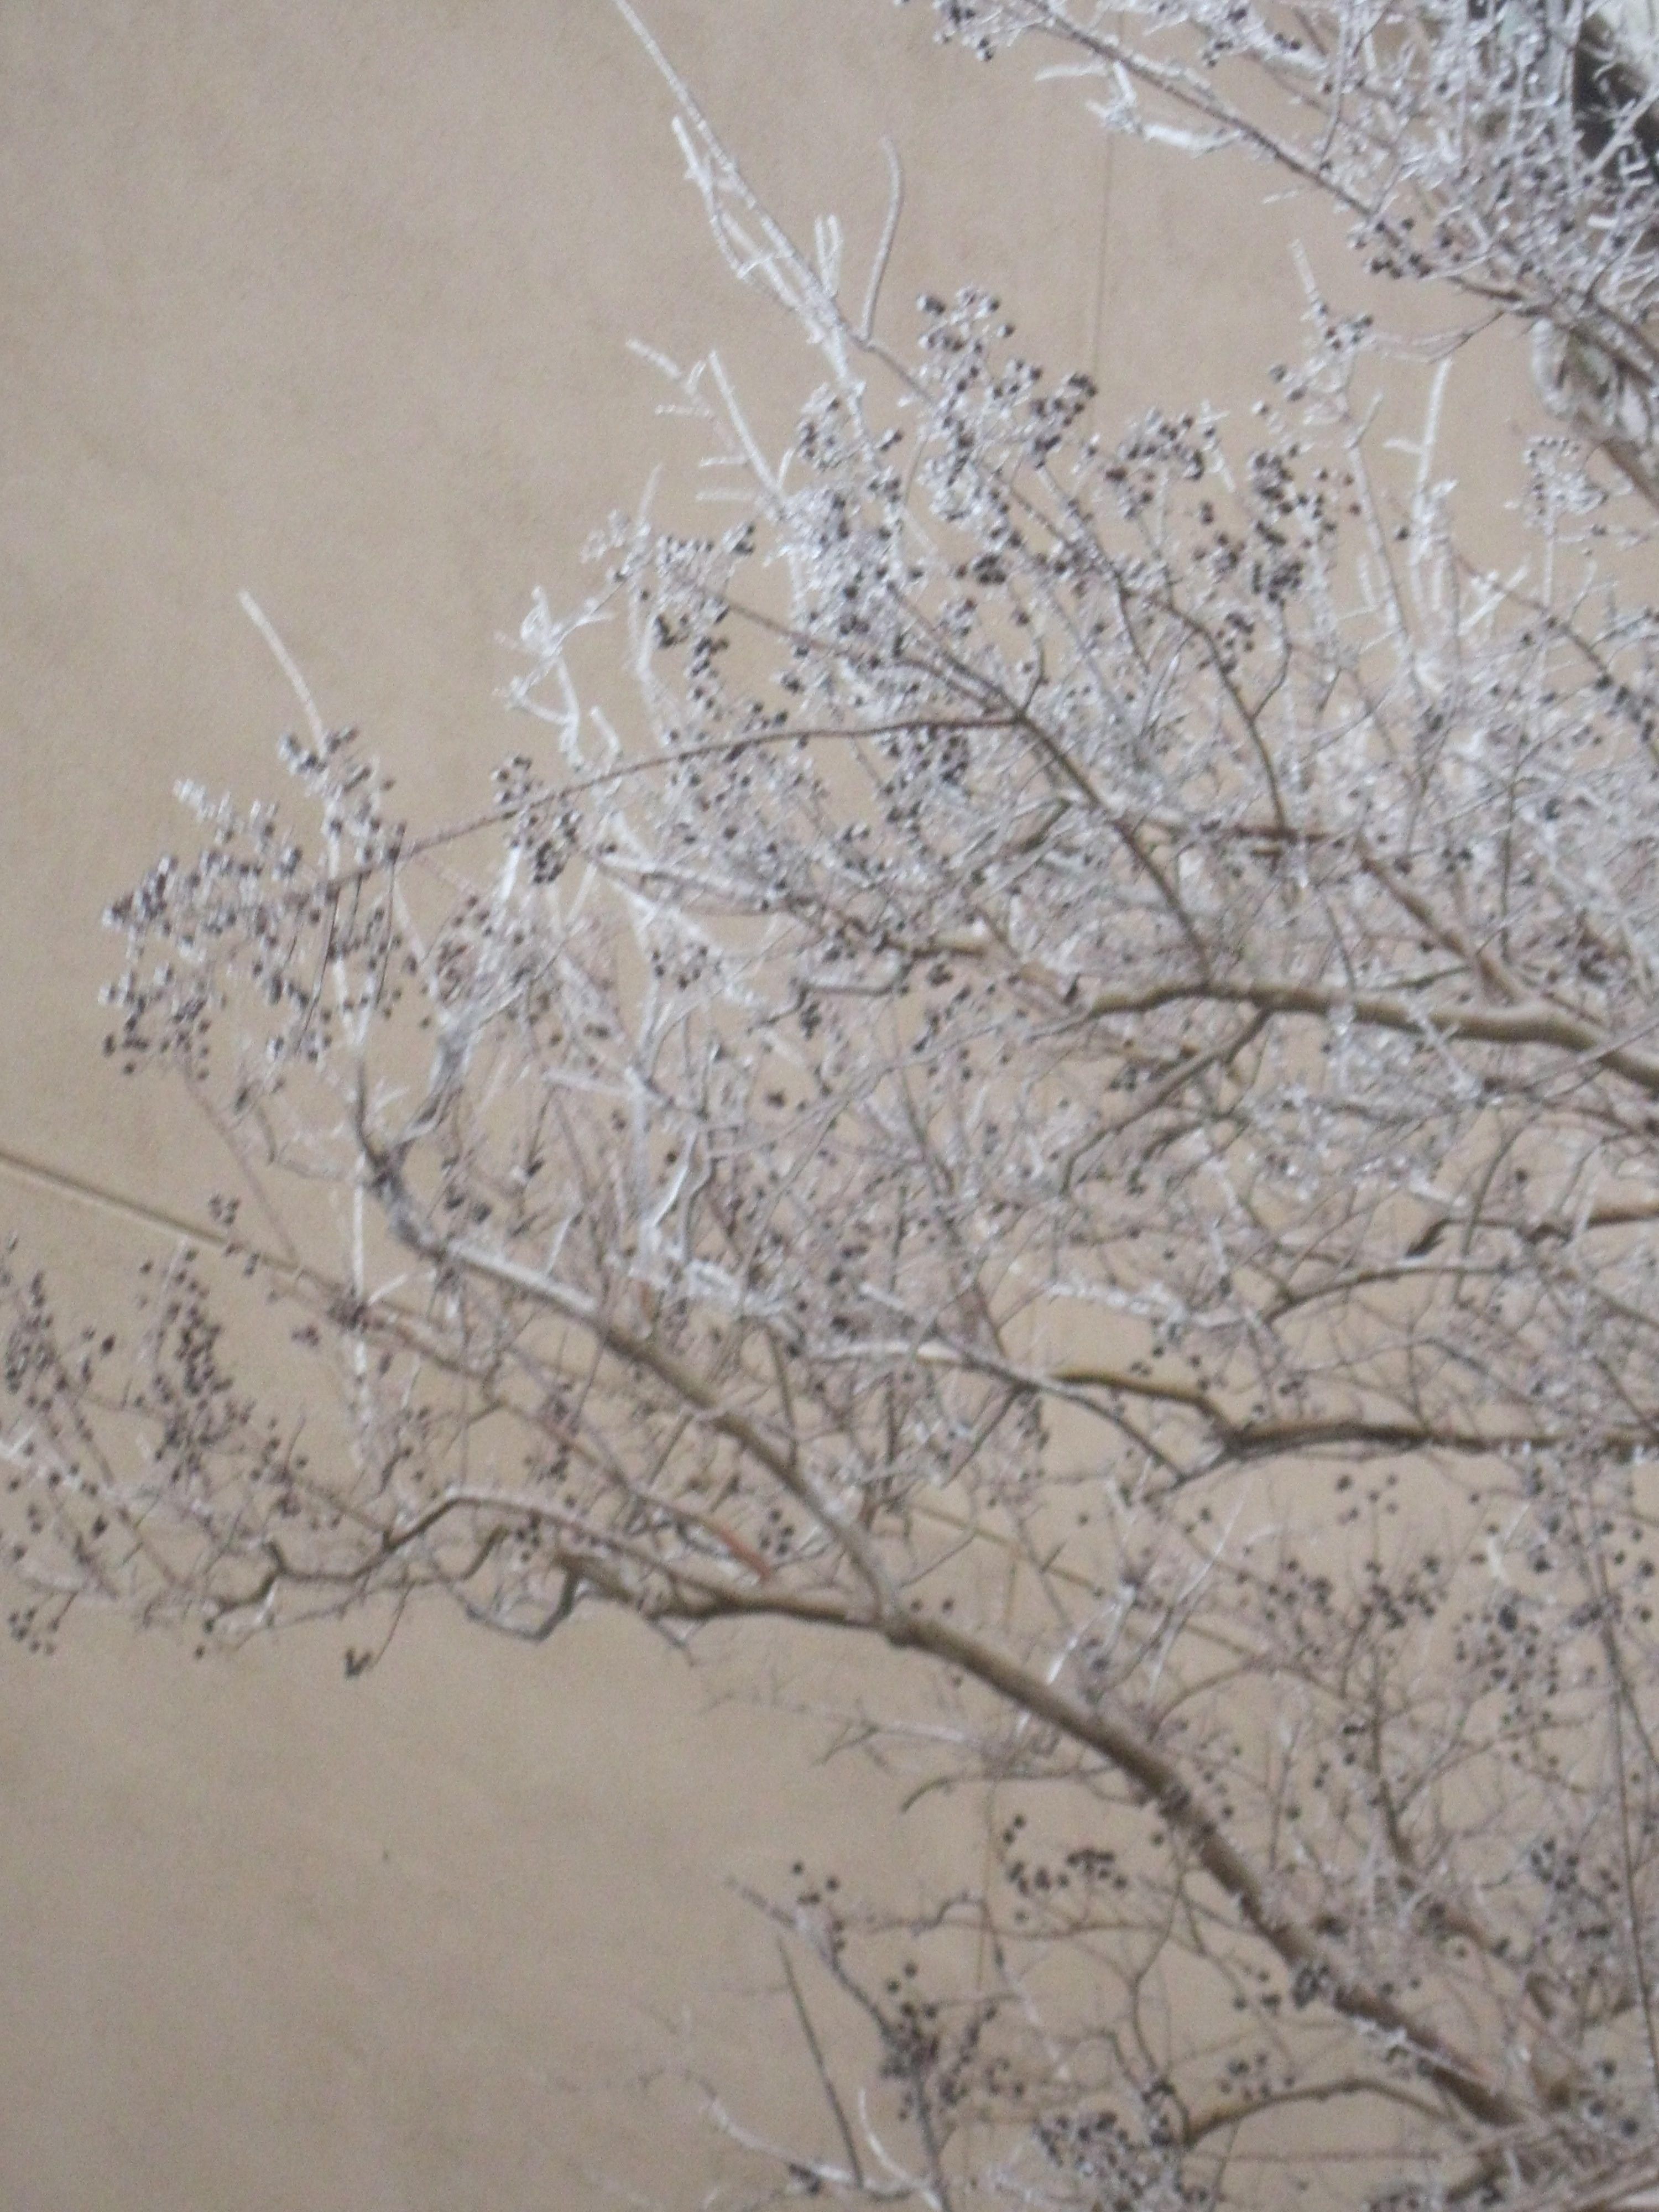 Ice on twigs